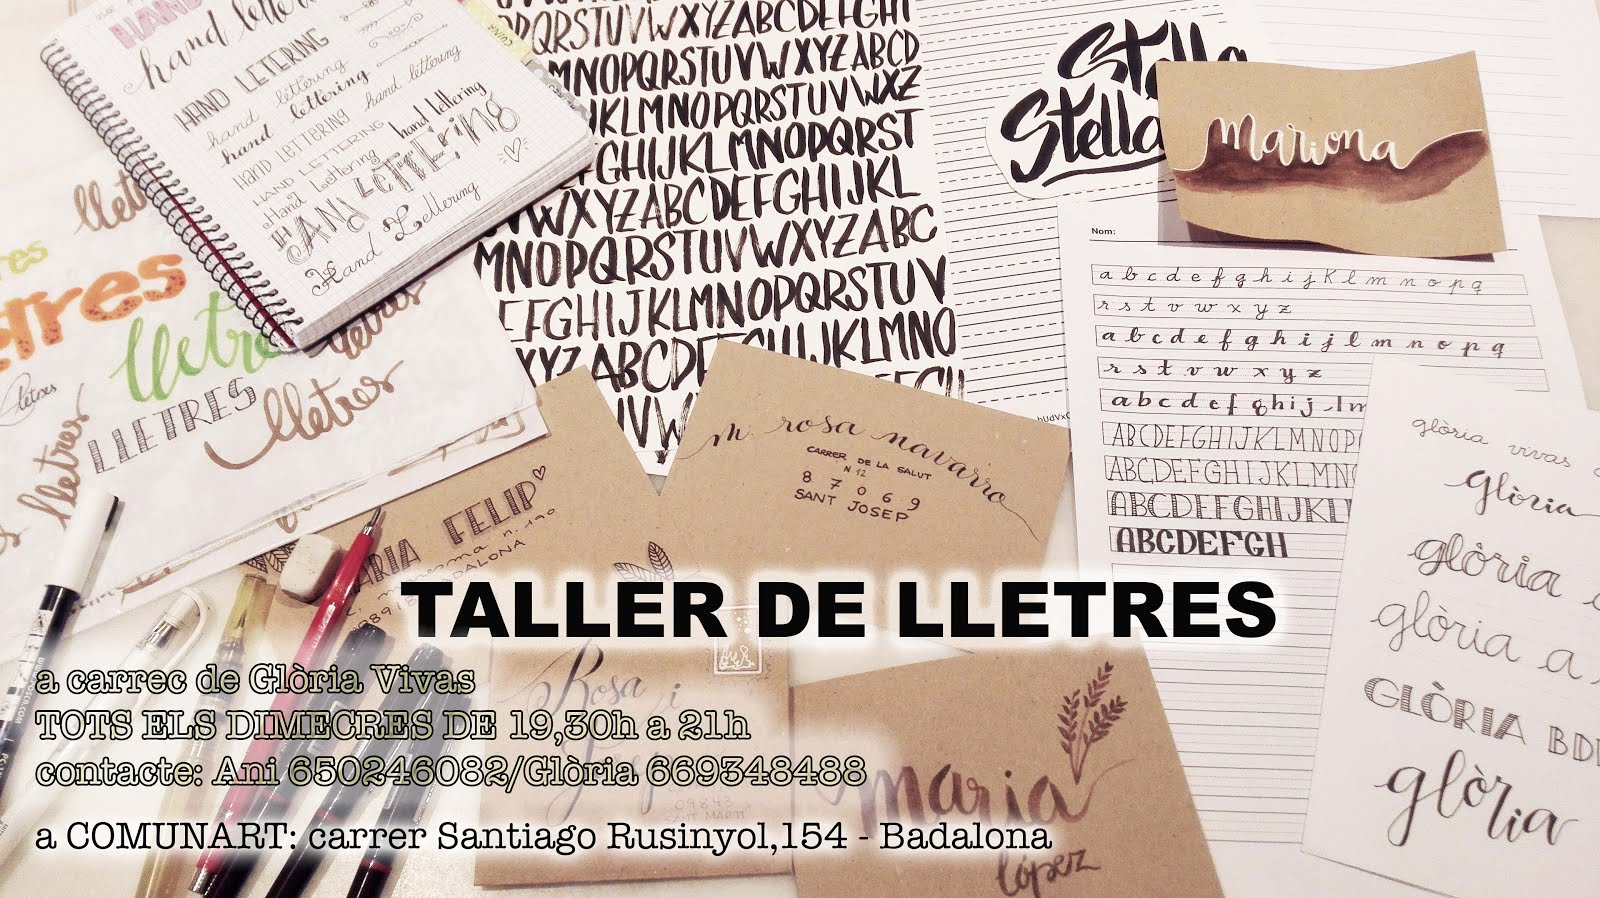 TALLER DE LLETRES